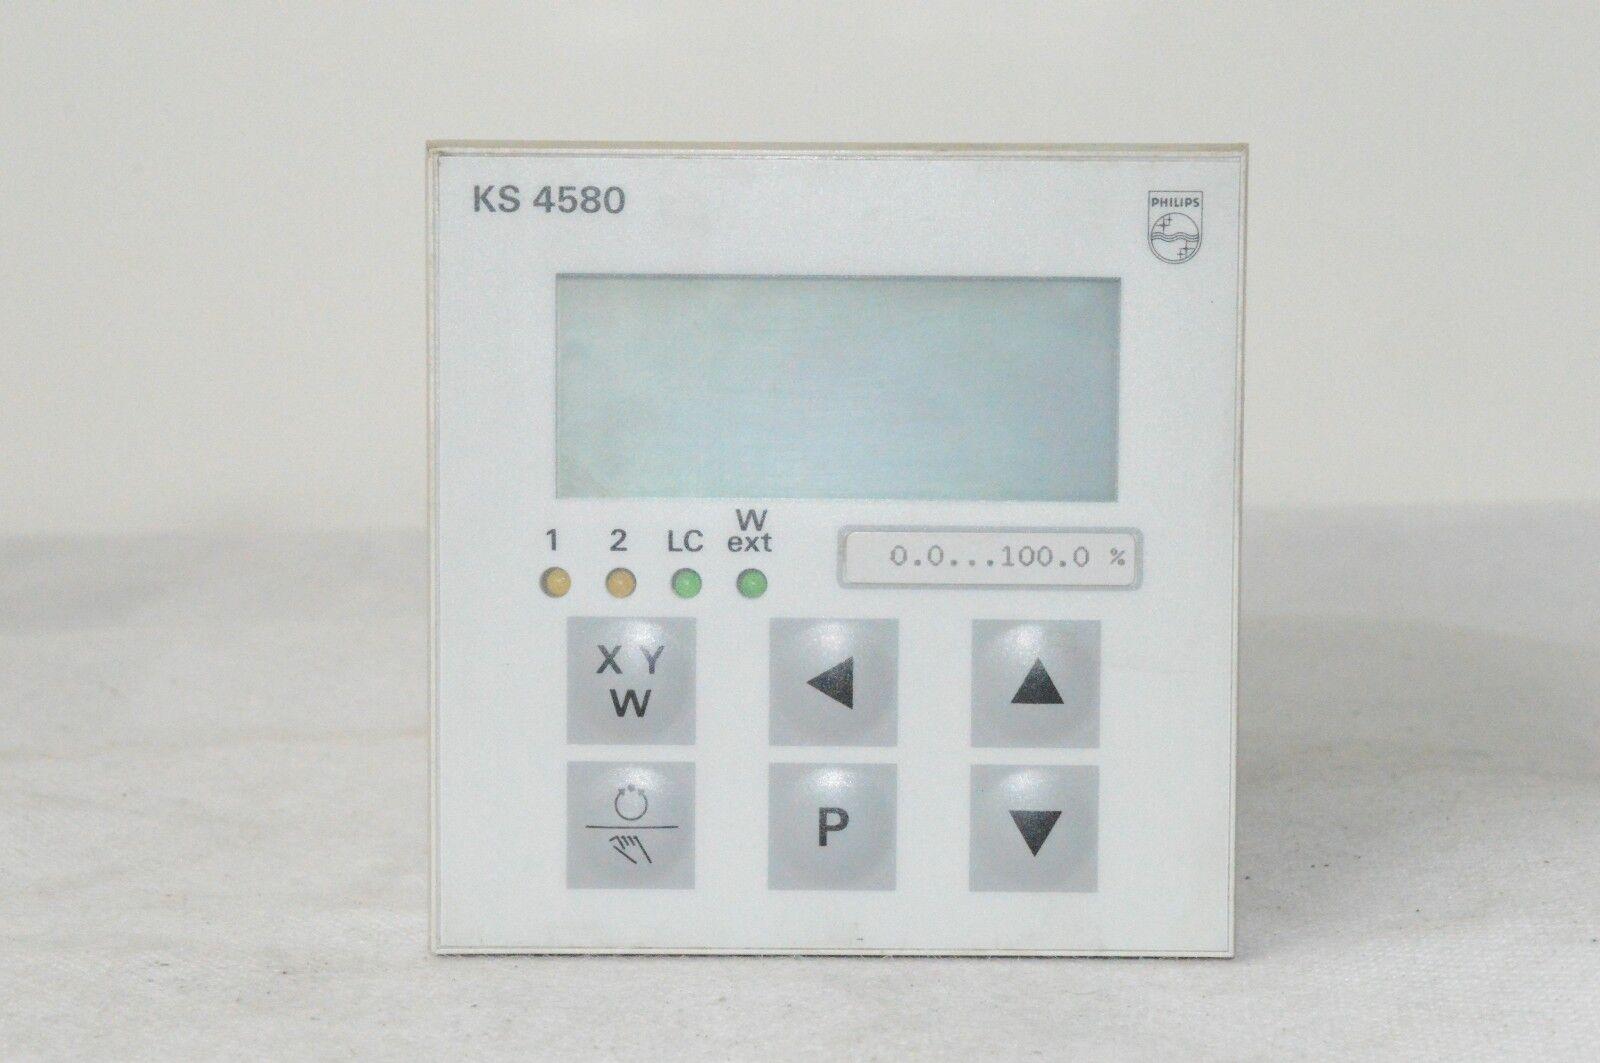 PHILIPS KS 4580   KS4580   industrial controller   9404 458 51031 (F.094)